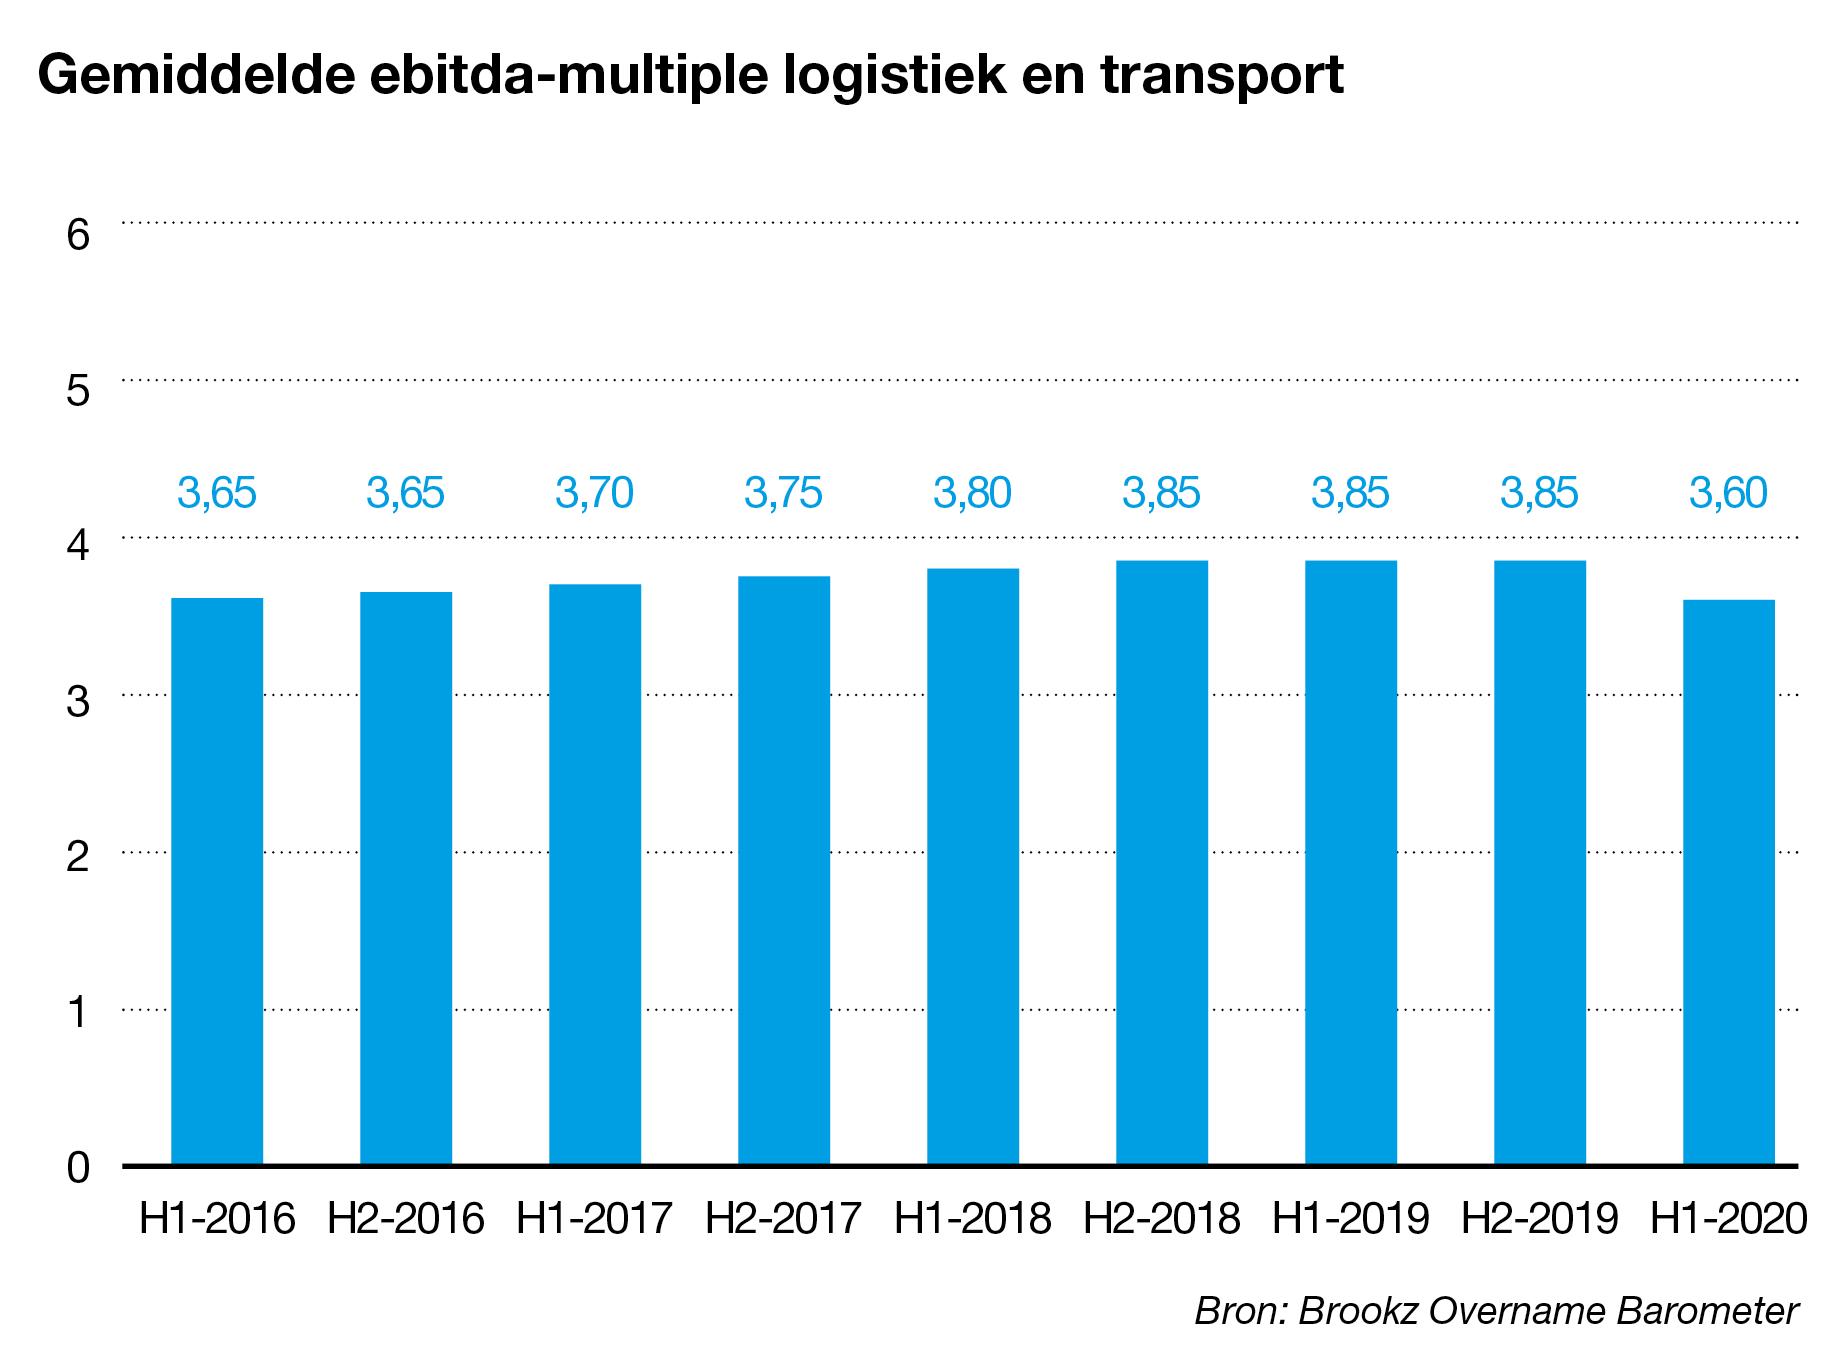 Ebitda-multiple logistiek en transport